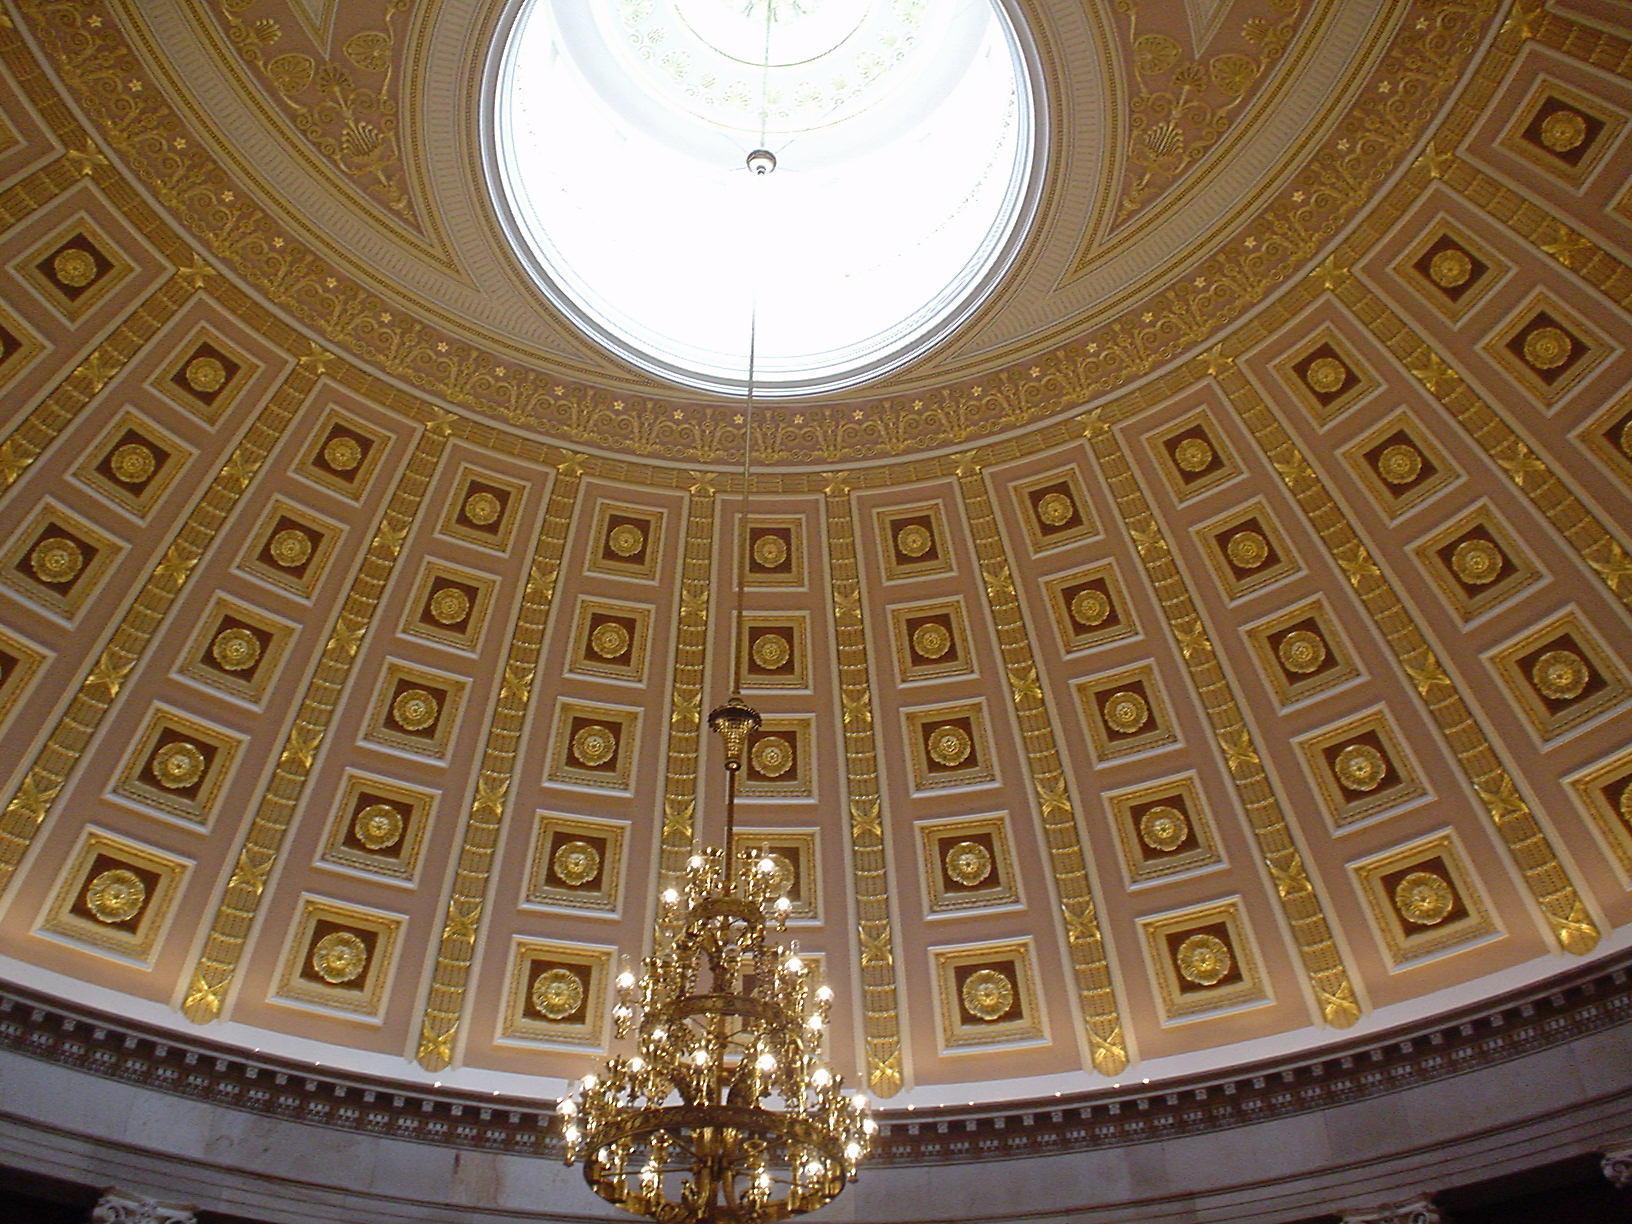 U.S. Capitol – Paint Analysis